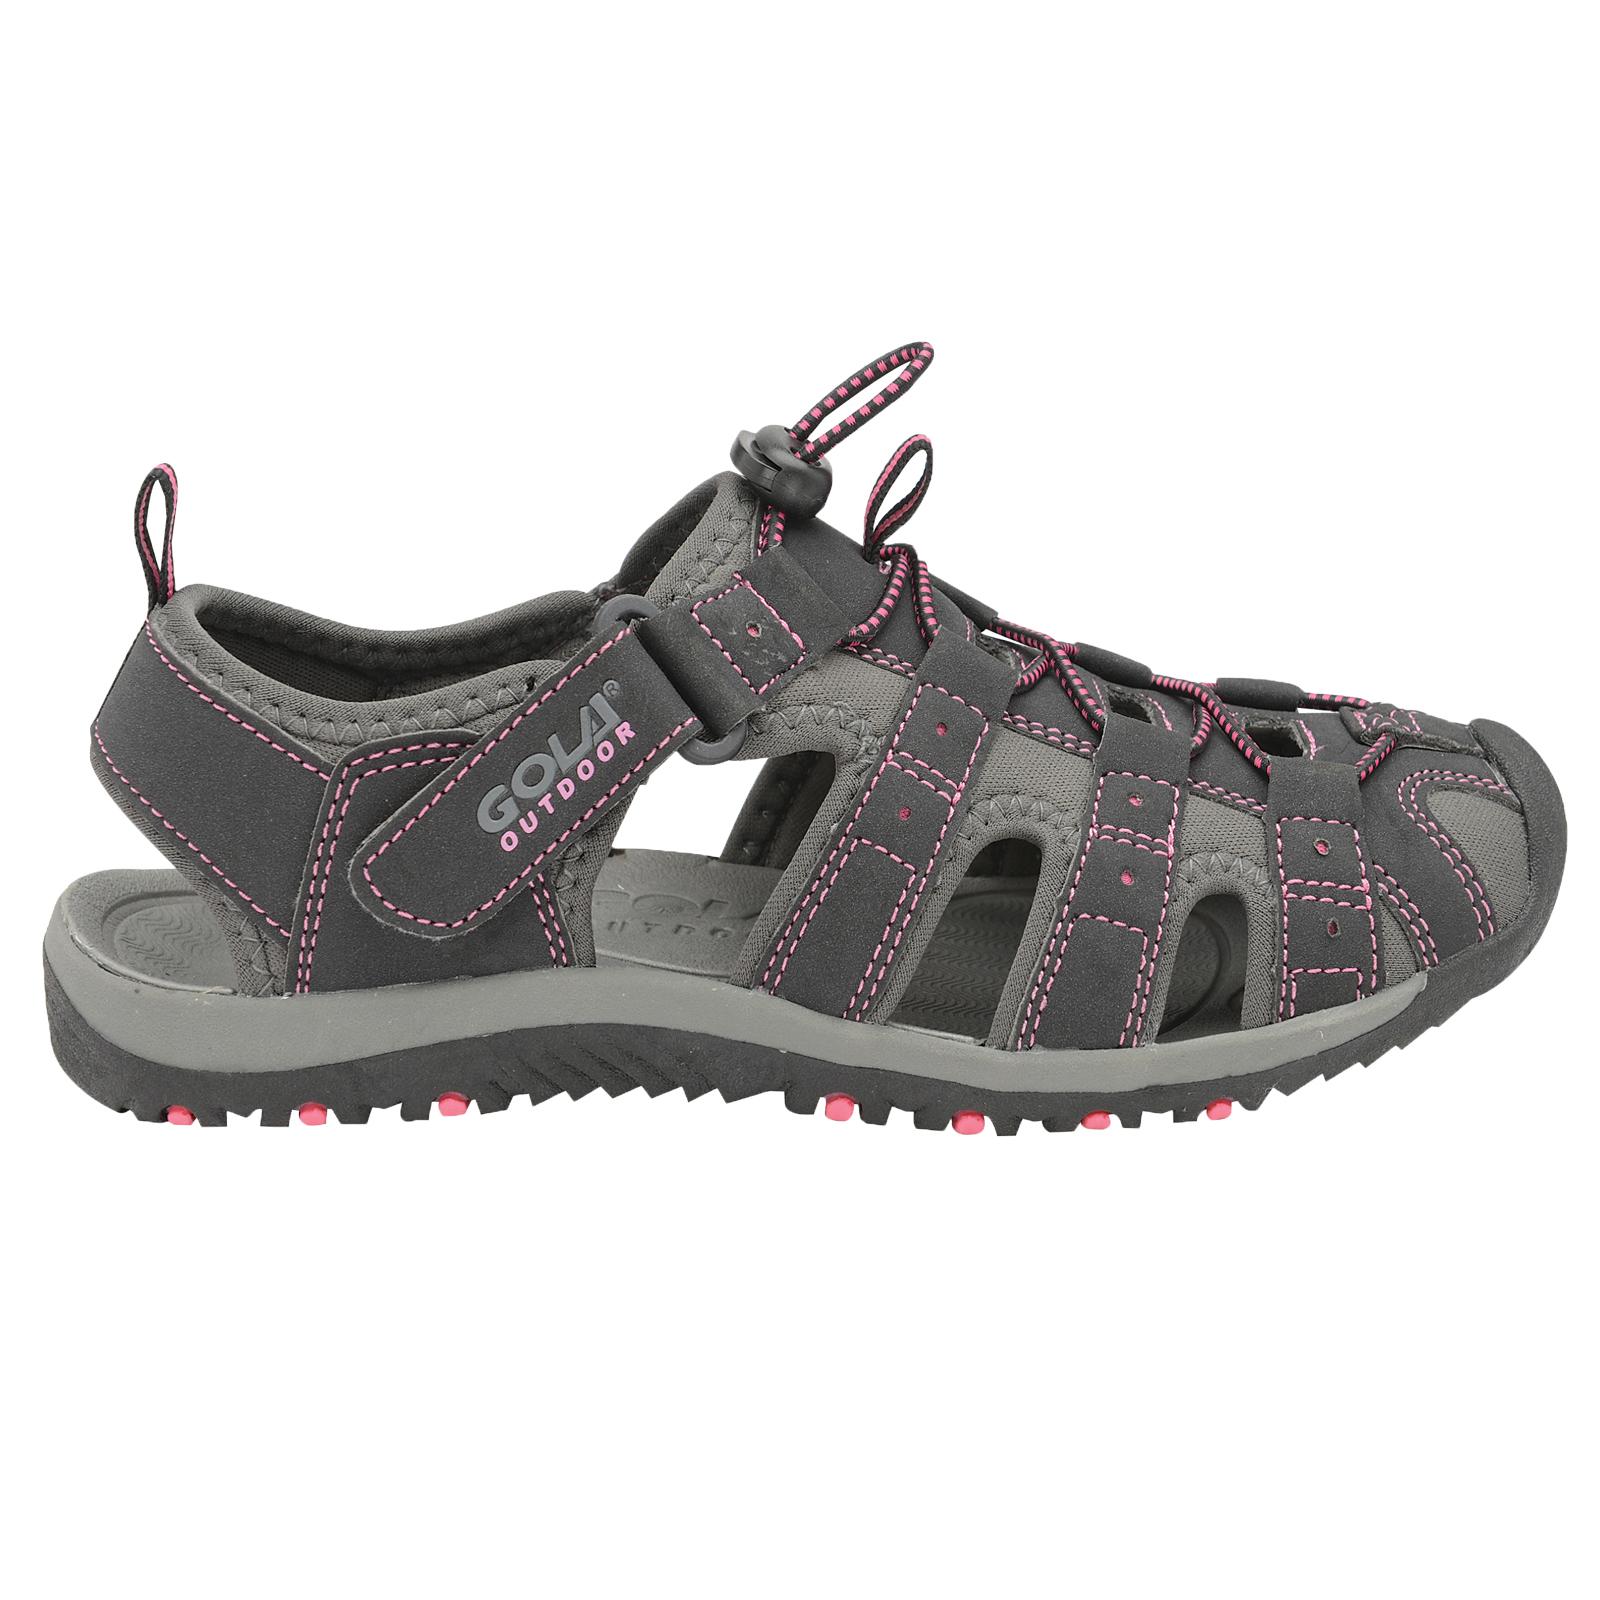 Womens Gola Shingle 3 Walking Sandals Ladies Outdoor Closed Toe Hiking Shoes